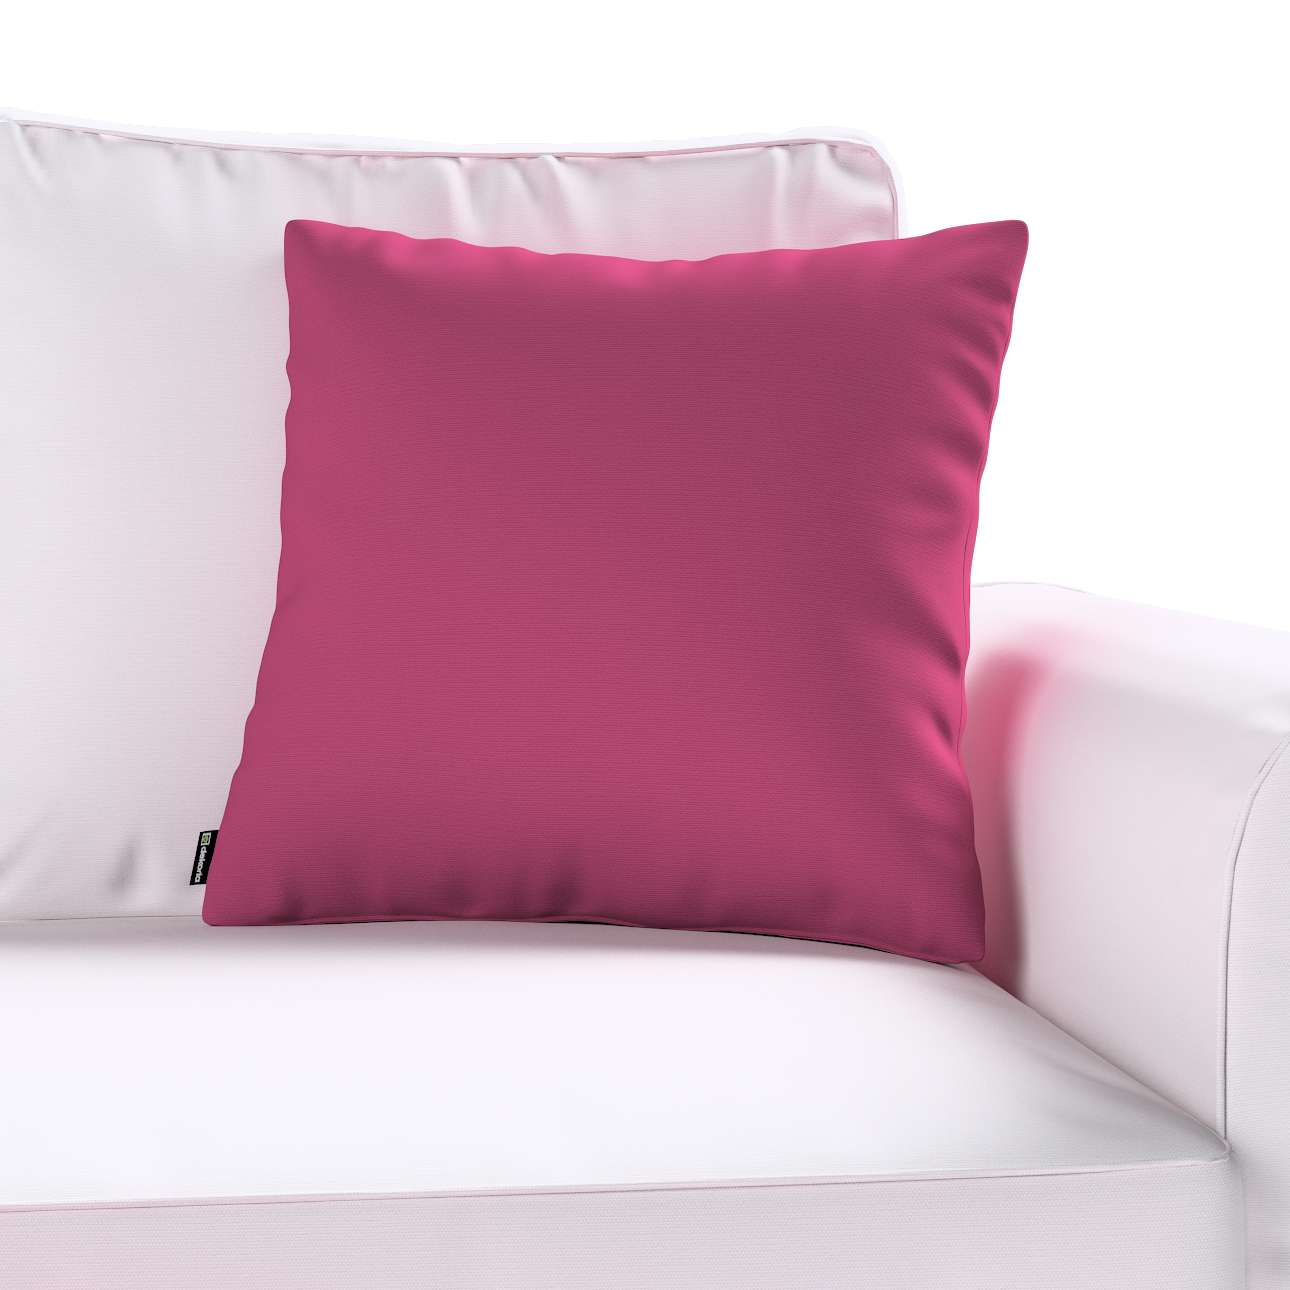 Kinga cushion cover in collection Panama Cotton, fabric: 702-32